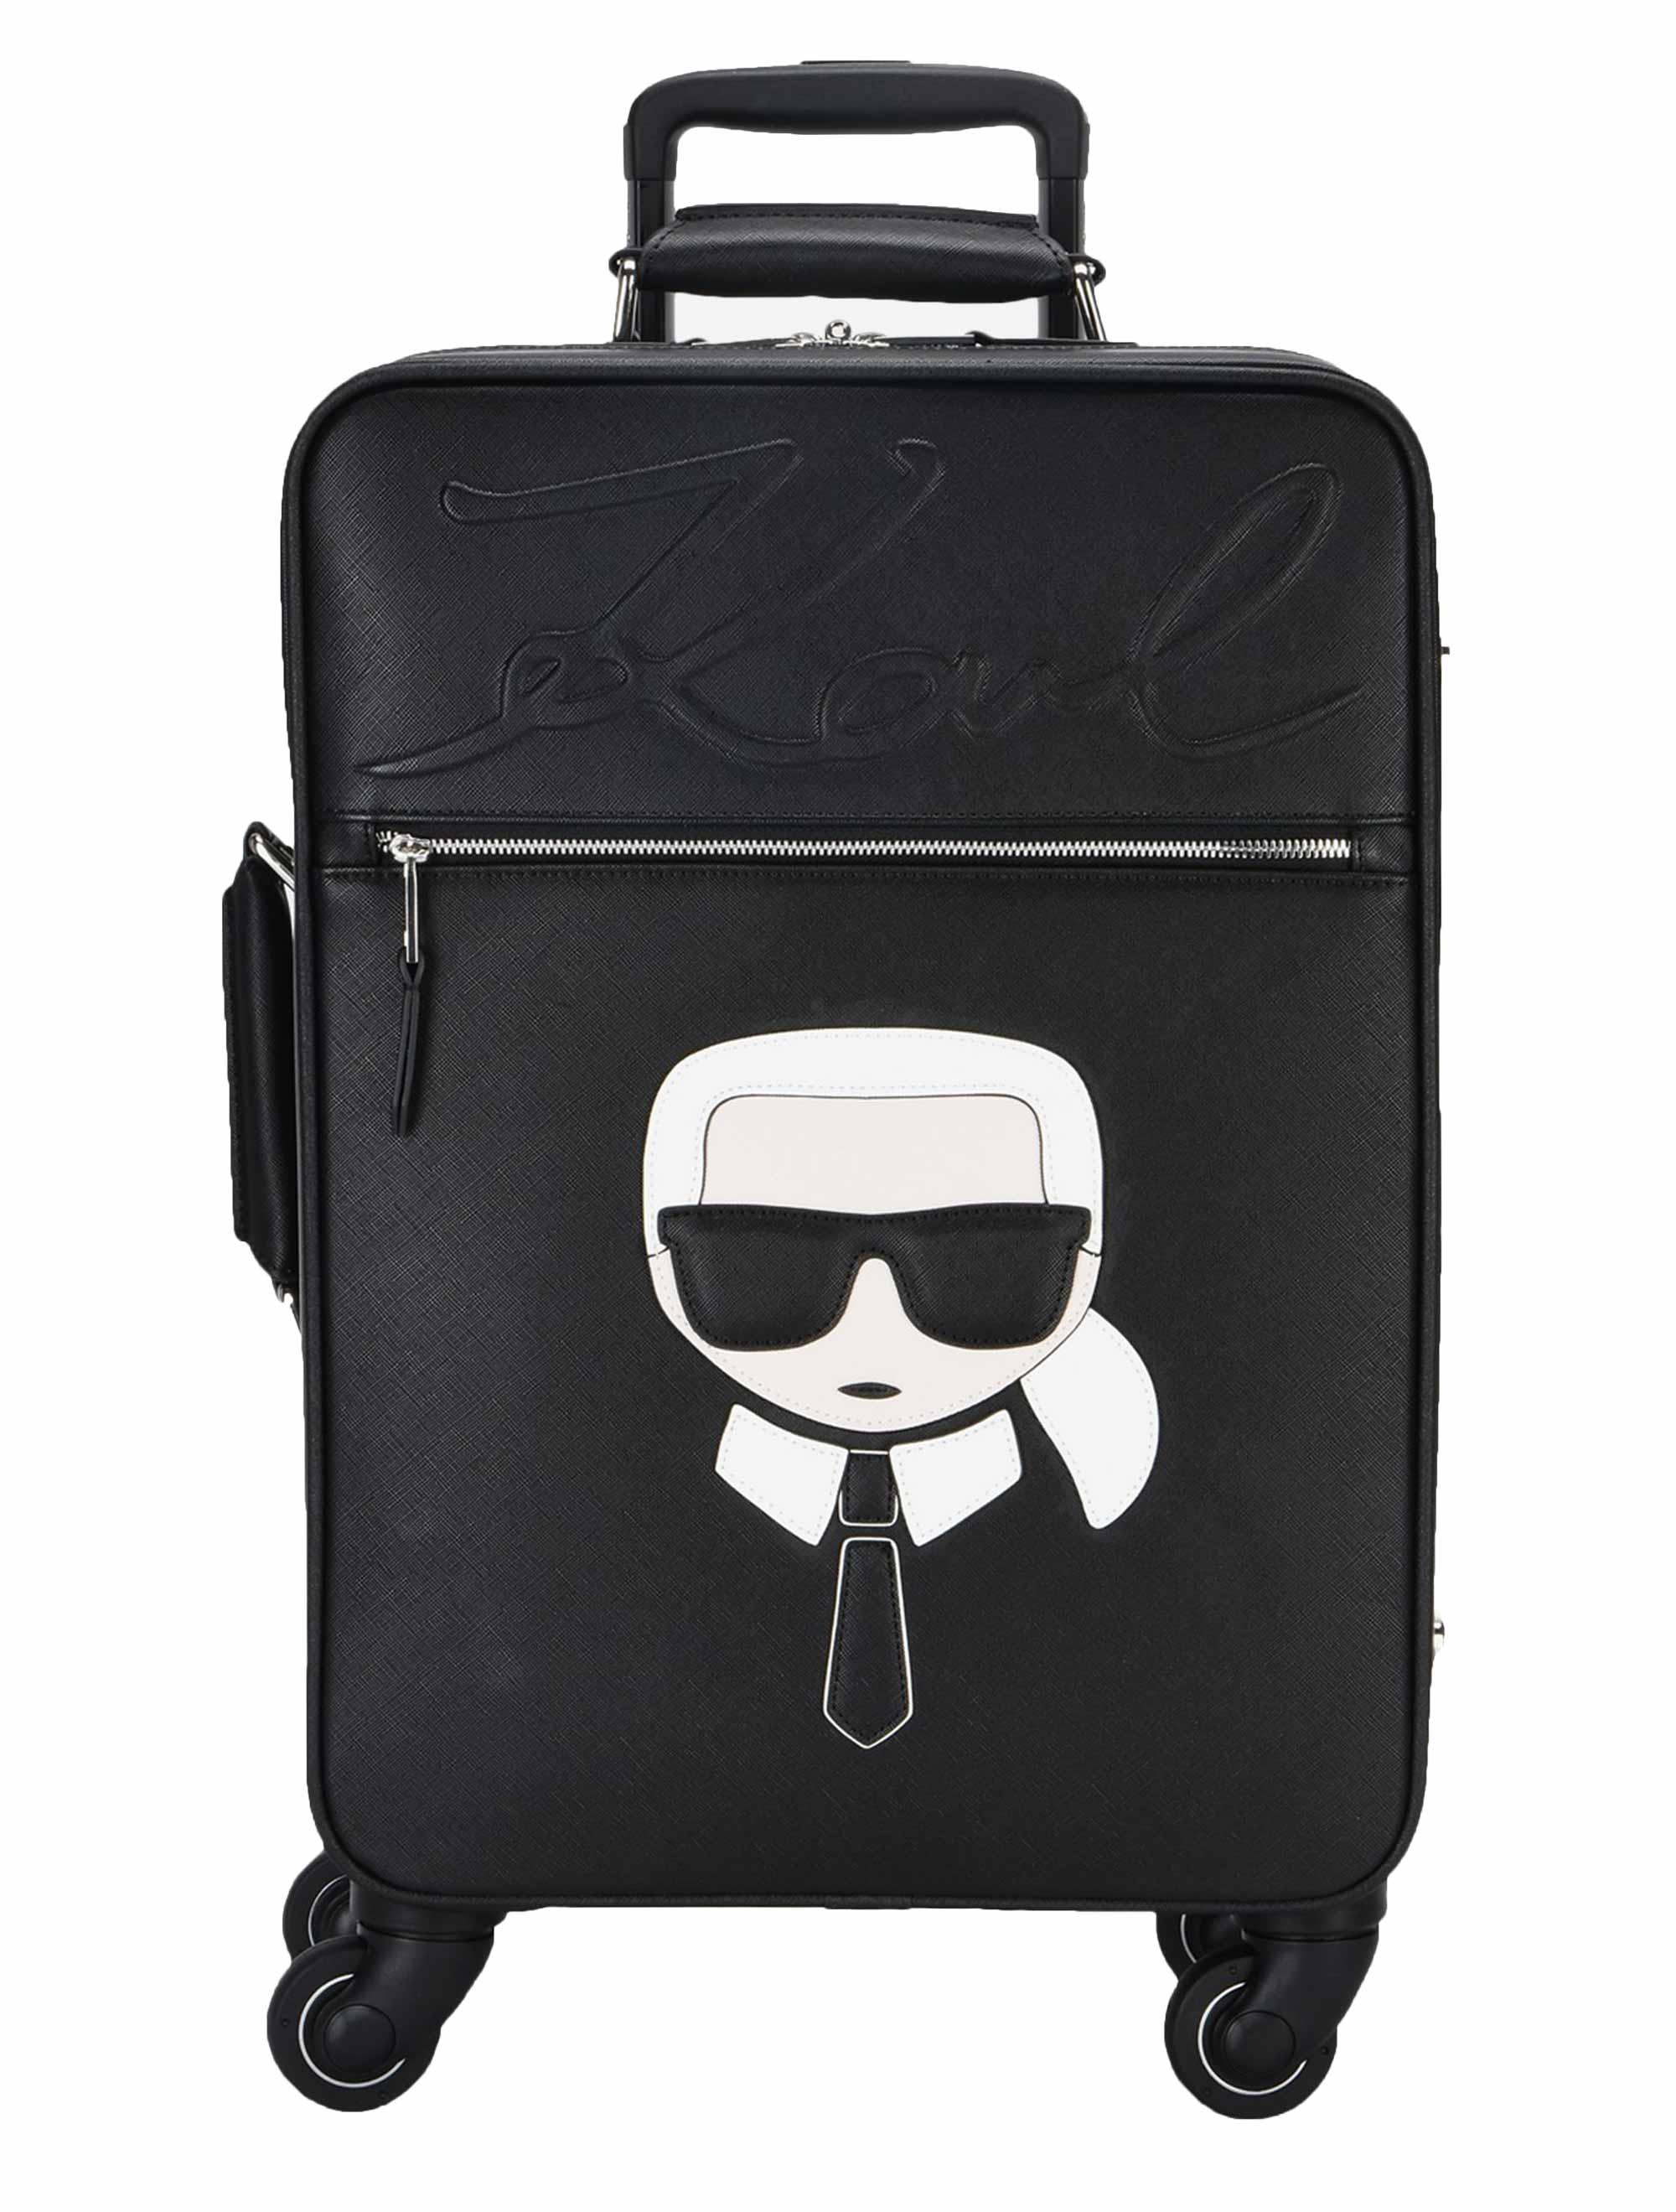 Karl Lagerfeld Ikonik Trolley